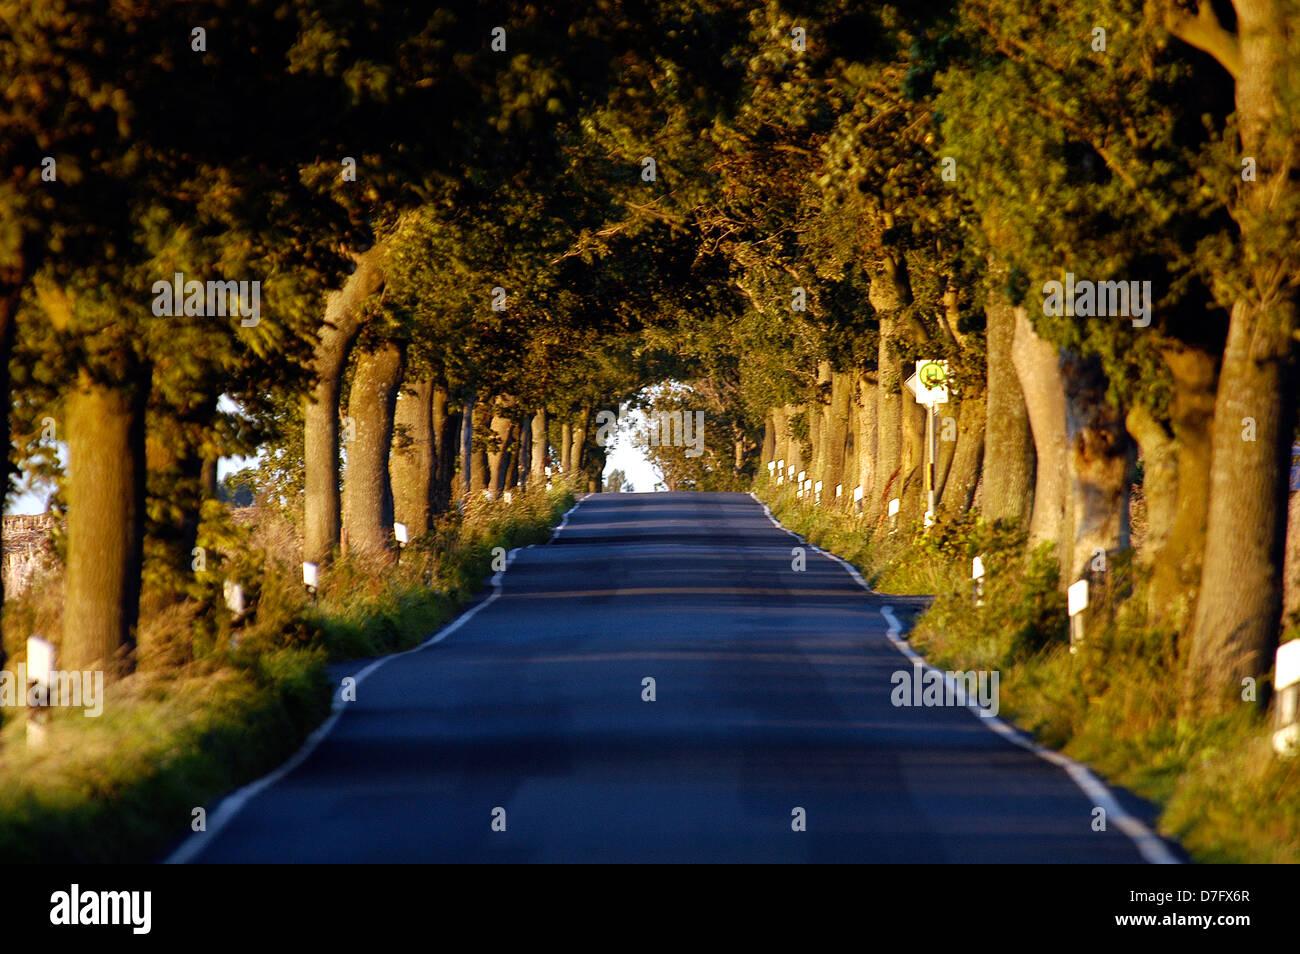 Ruegen, avenue, avenues, street, trees, Ostsee, Rügen, Allee, Alleen - Stock Image